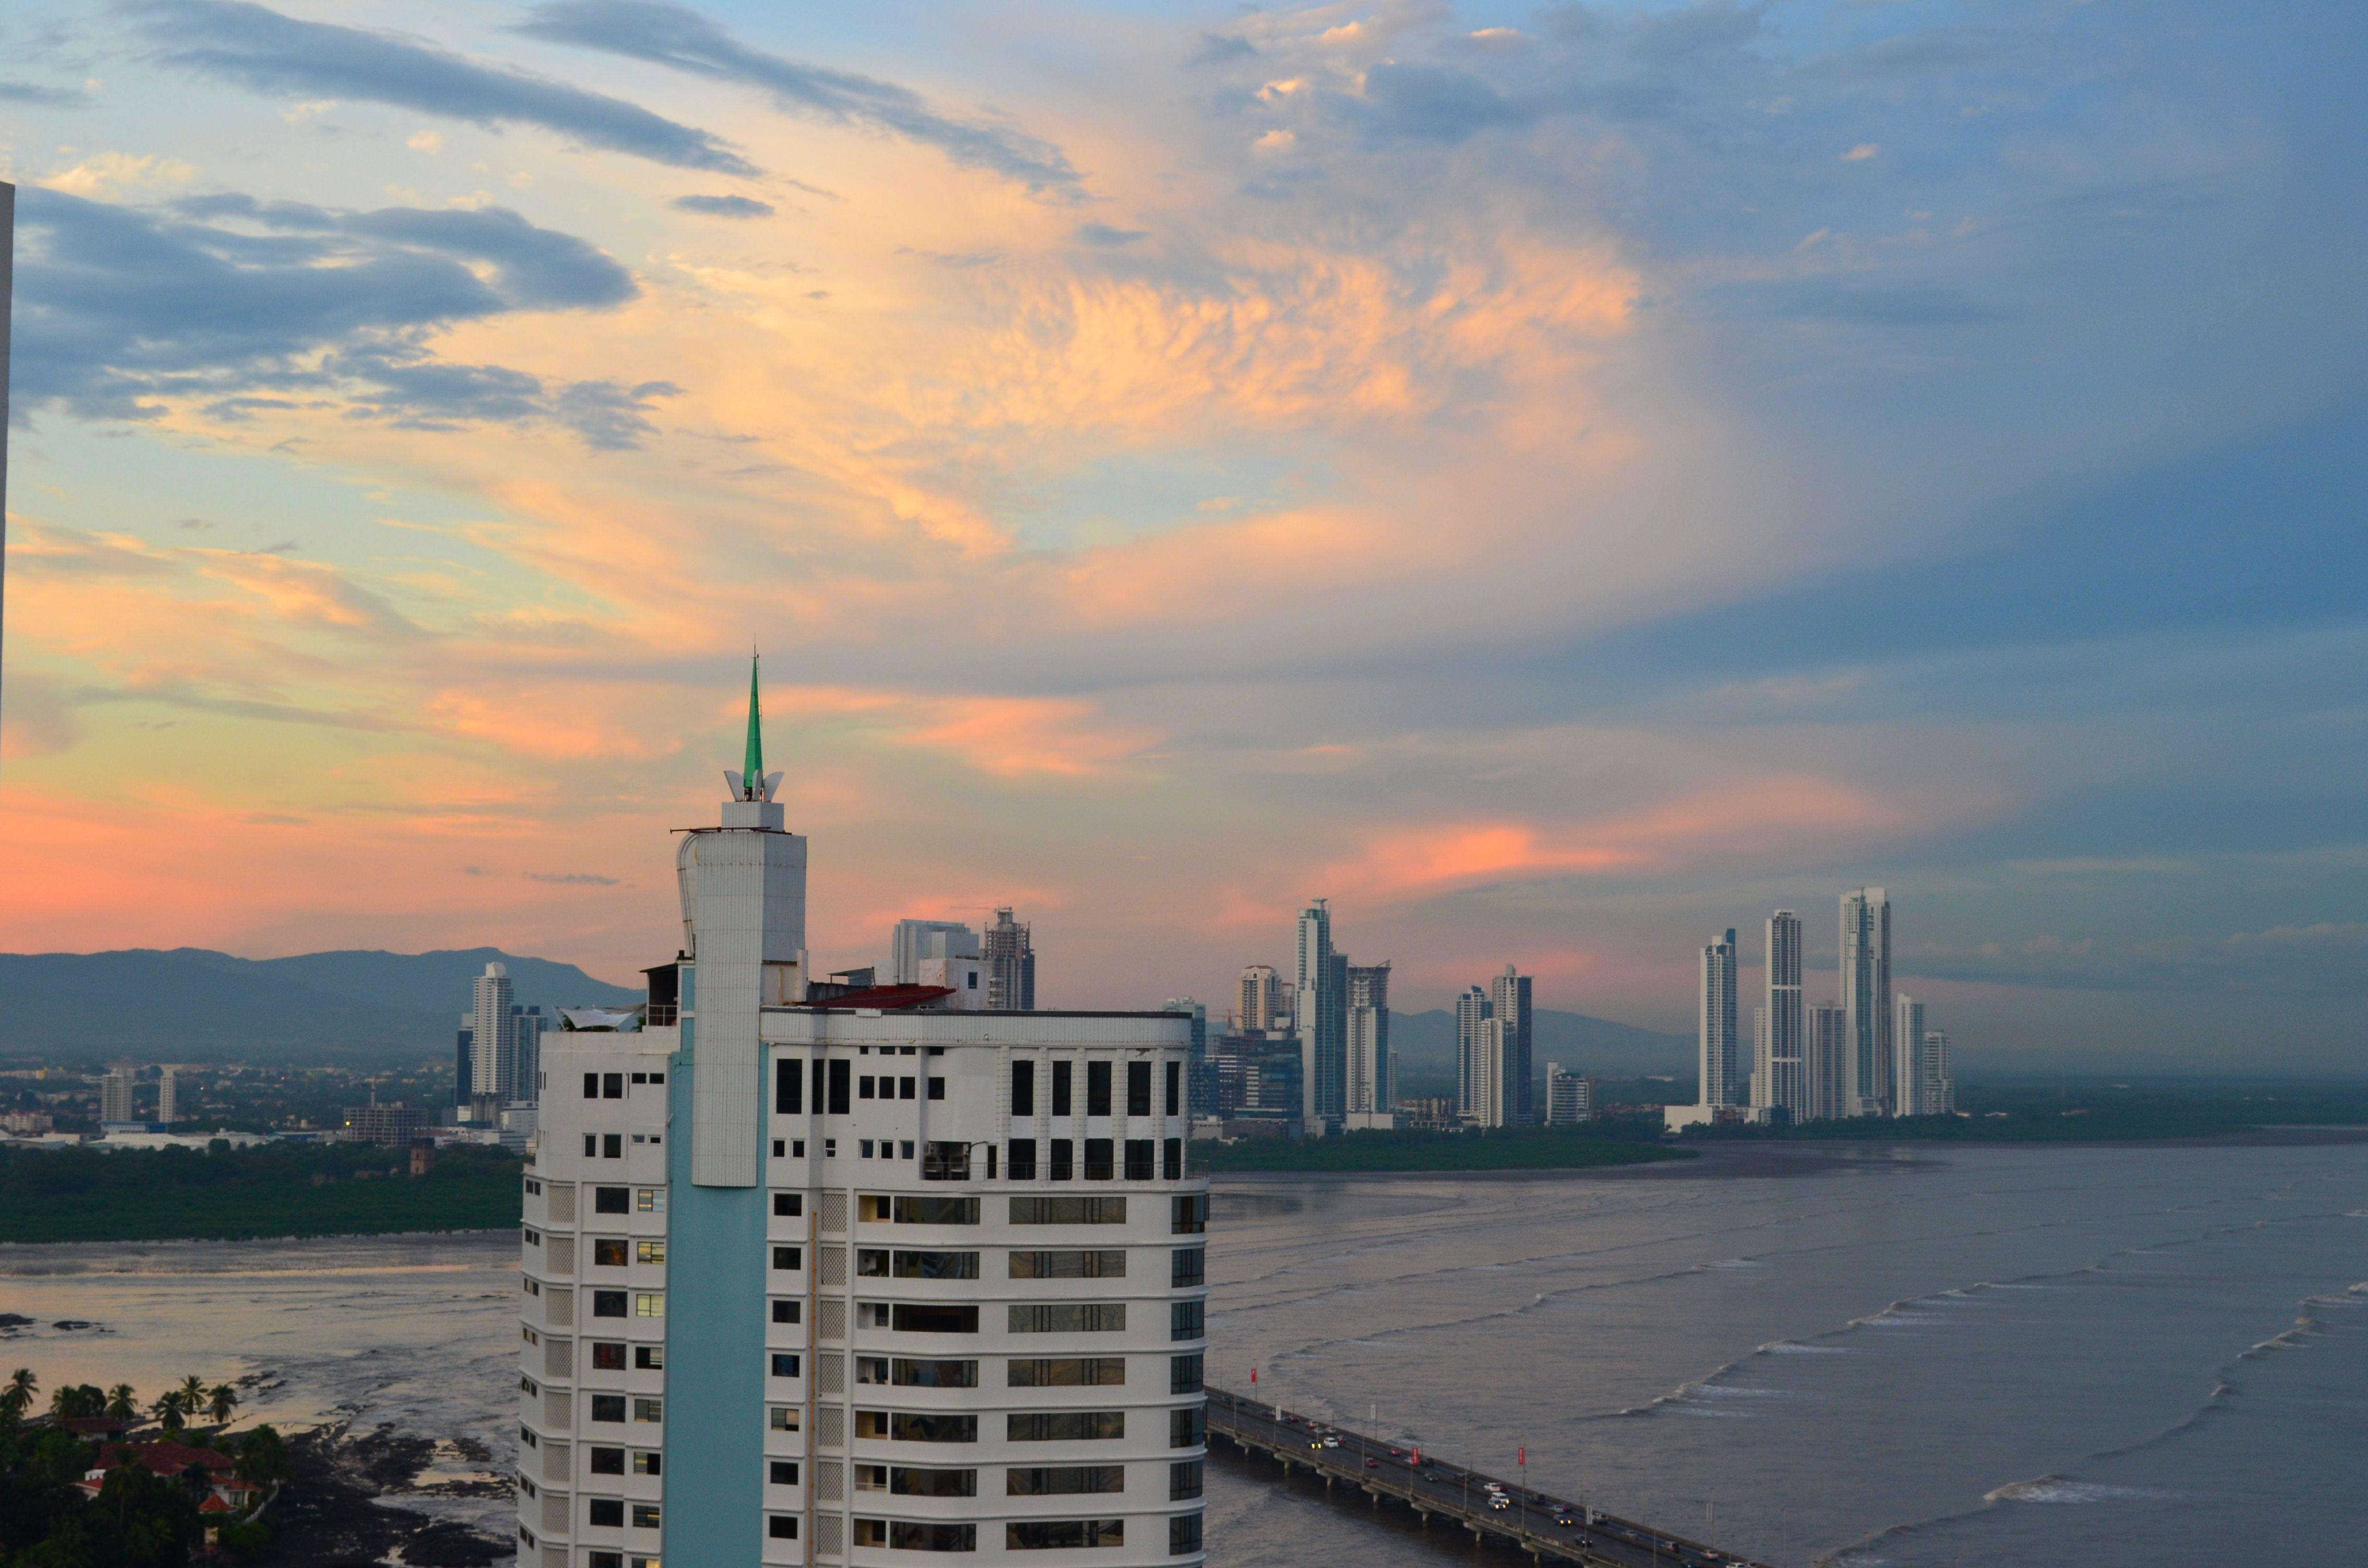 Panama sunset | El Gringo Panamá